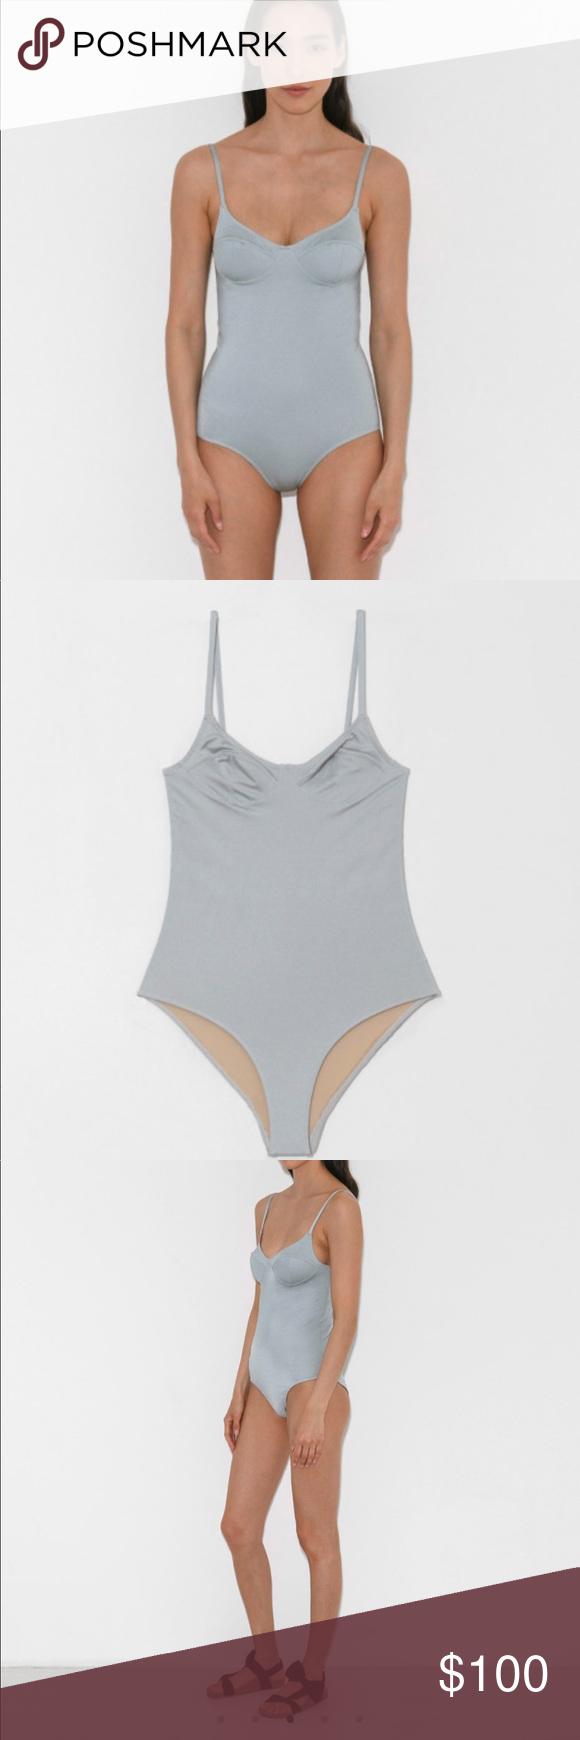 faa1b8dfbfb Baserange Swimsuit⚡ ⚡ Baserange Soft Swimsuit in Rio Blue. One piece  swimsuit